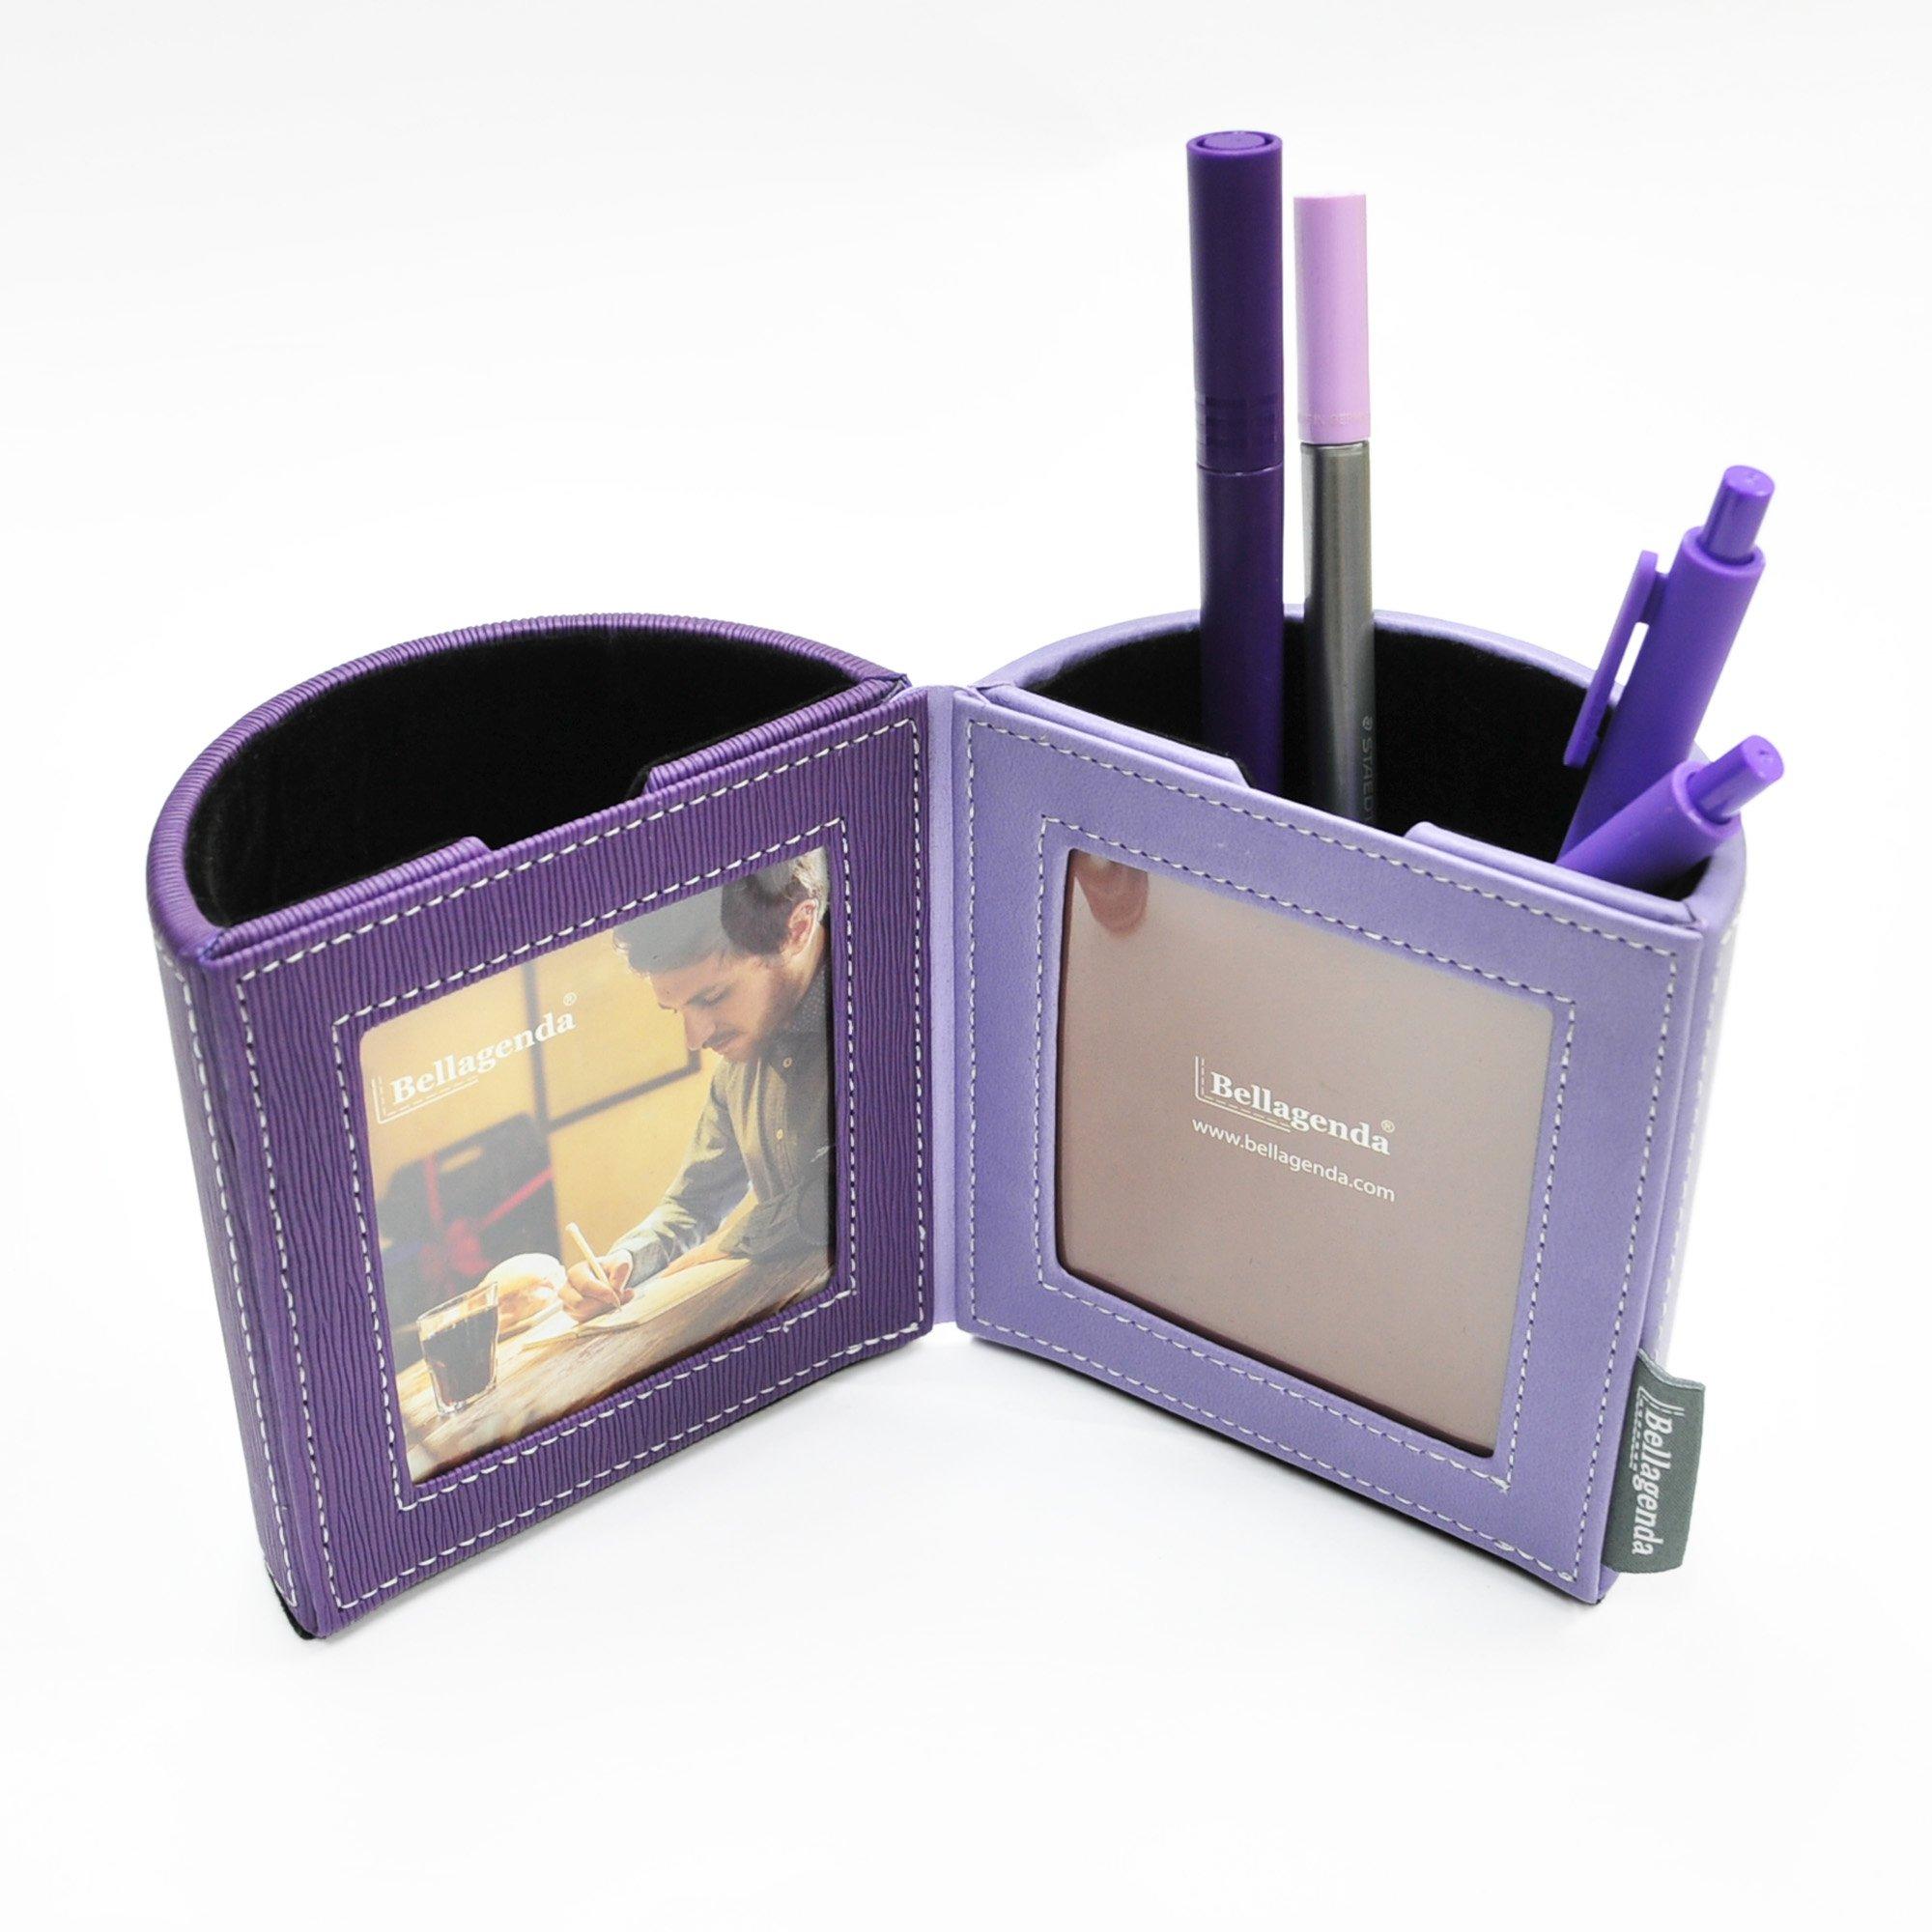 Pen Pencil Holder with Photo Frames | Desk Organizer | Desk Decoration | Multi Function Desk Stationery | Space Saver | 2 Picture Frames | Handicraft | PU Leather & Suede (Purple)